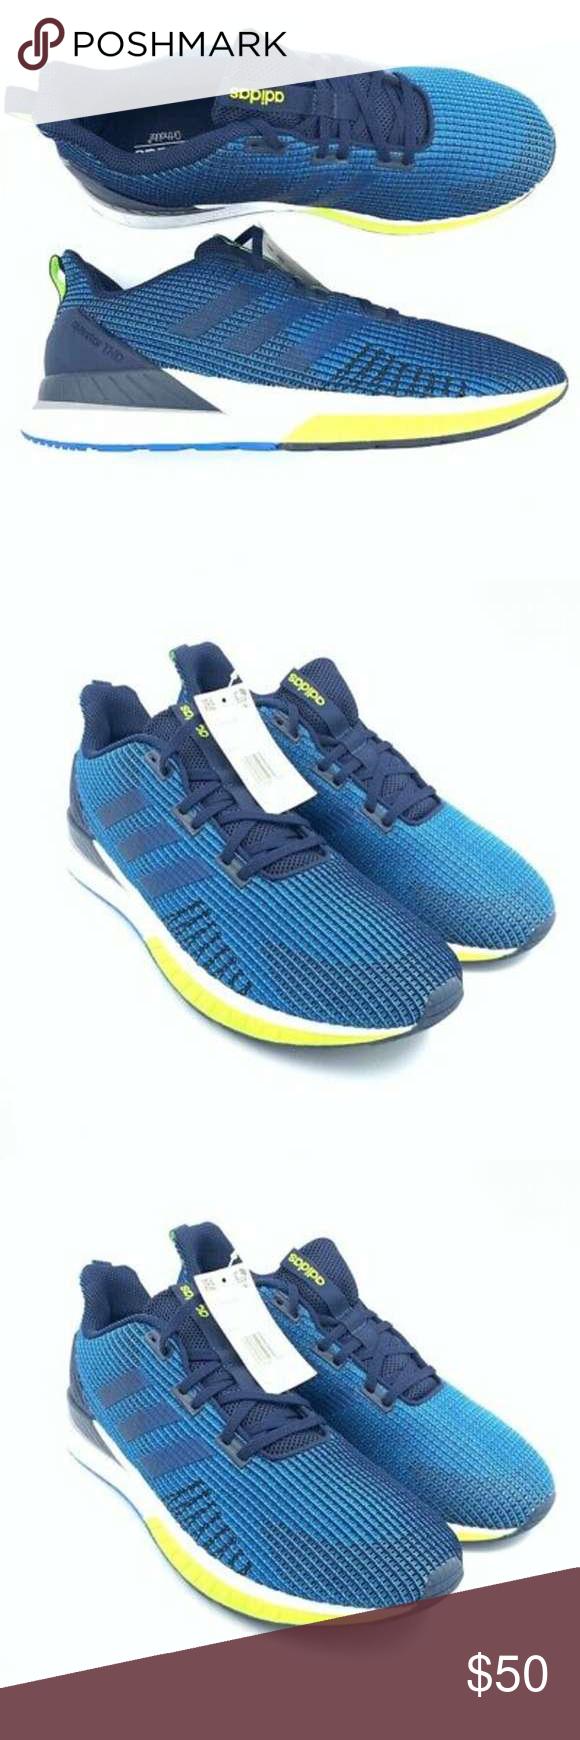 Adidas Questar TND Mens Running Shoes 12   Running shoes for men ...